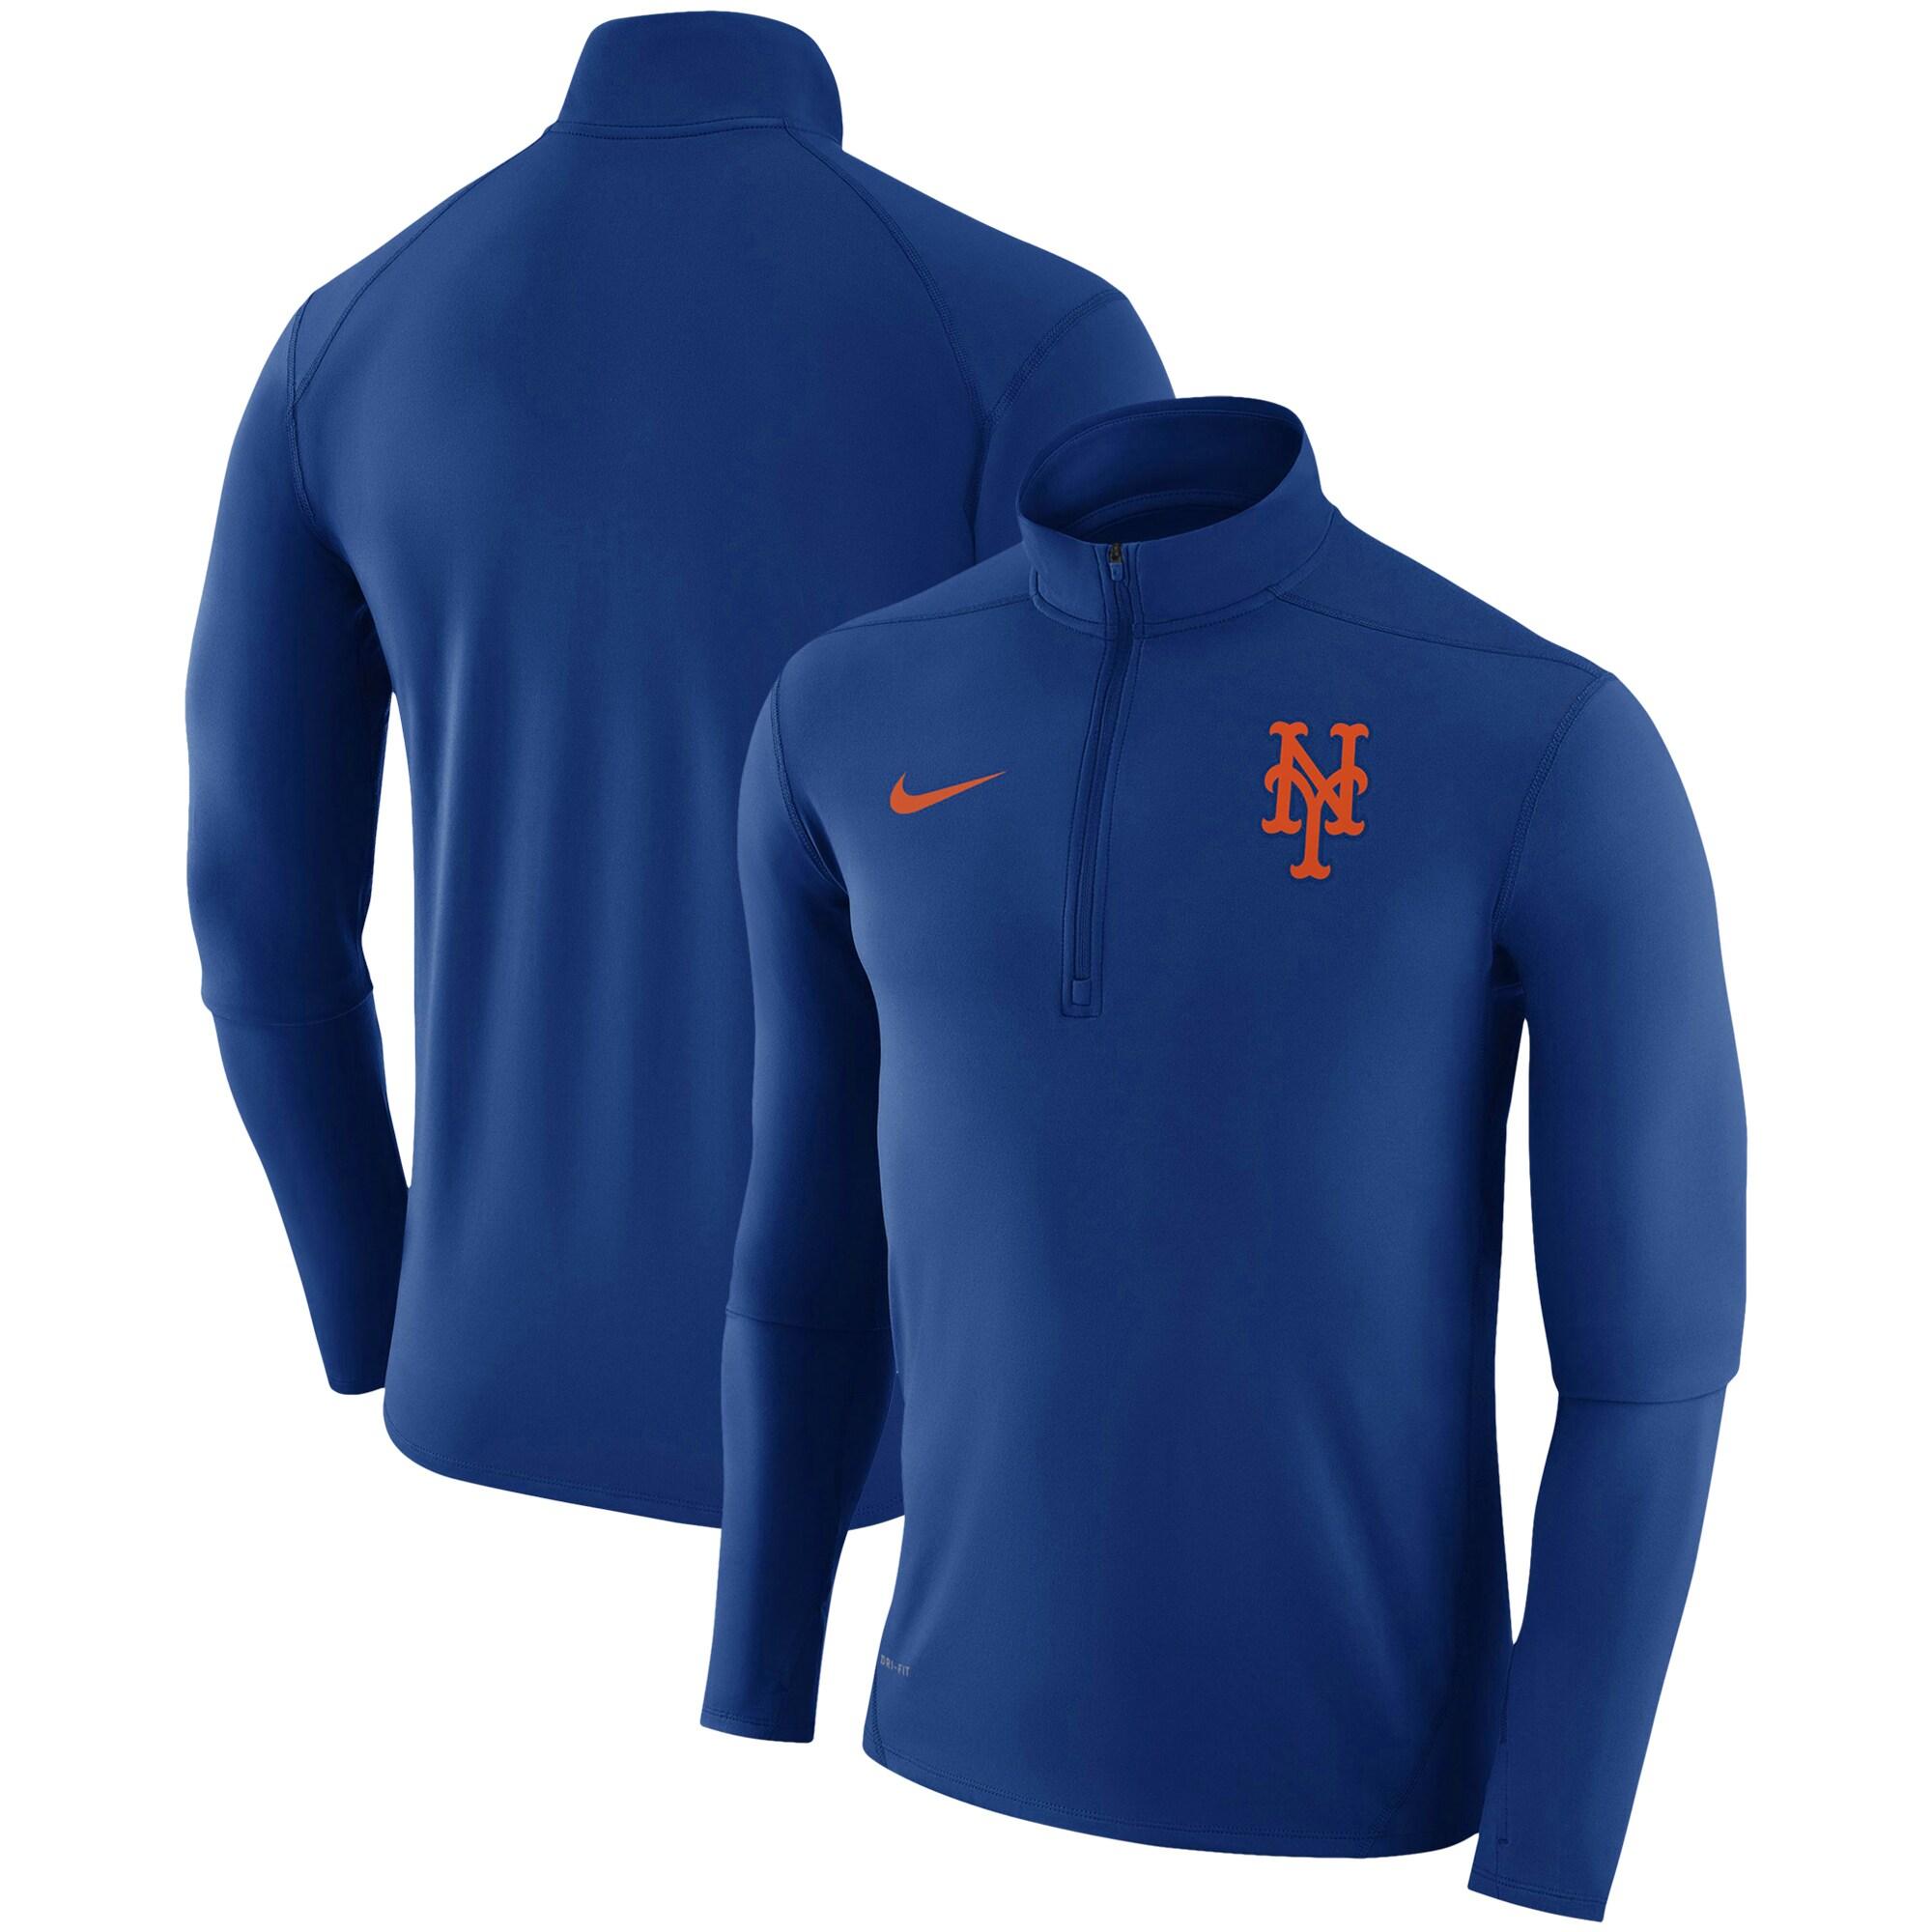 New York Mets Nike Element Half-Zip Performance Top - Royal